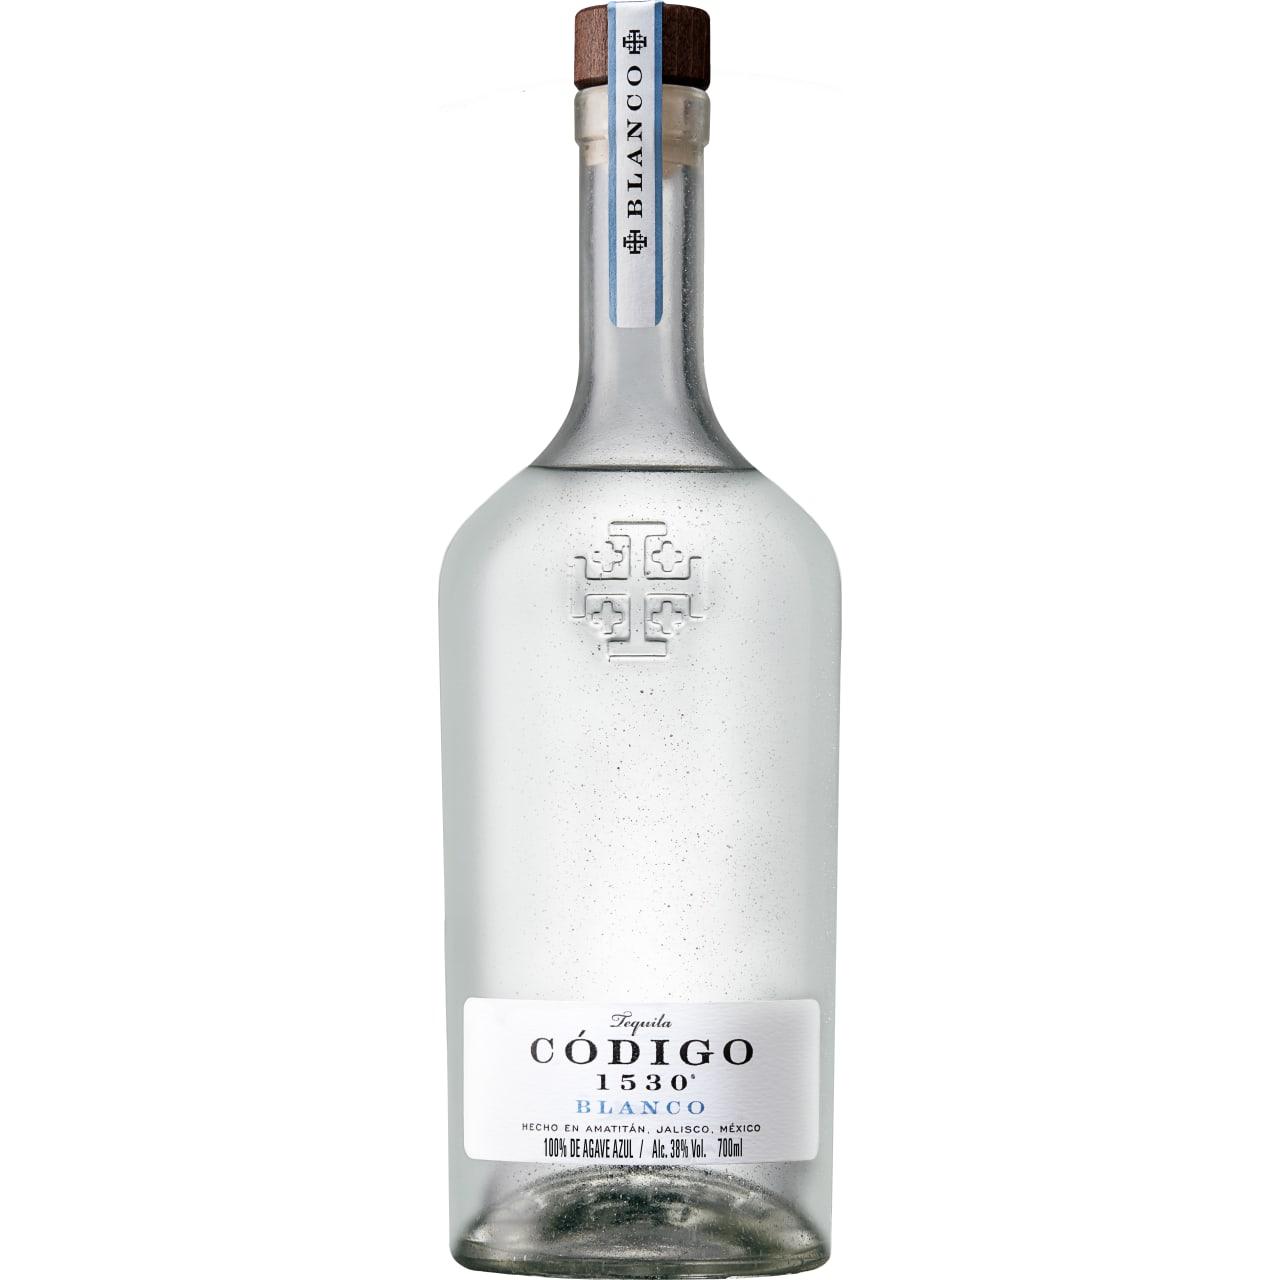 Product Image - Código 1530 Blanco Tequila